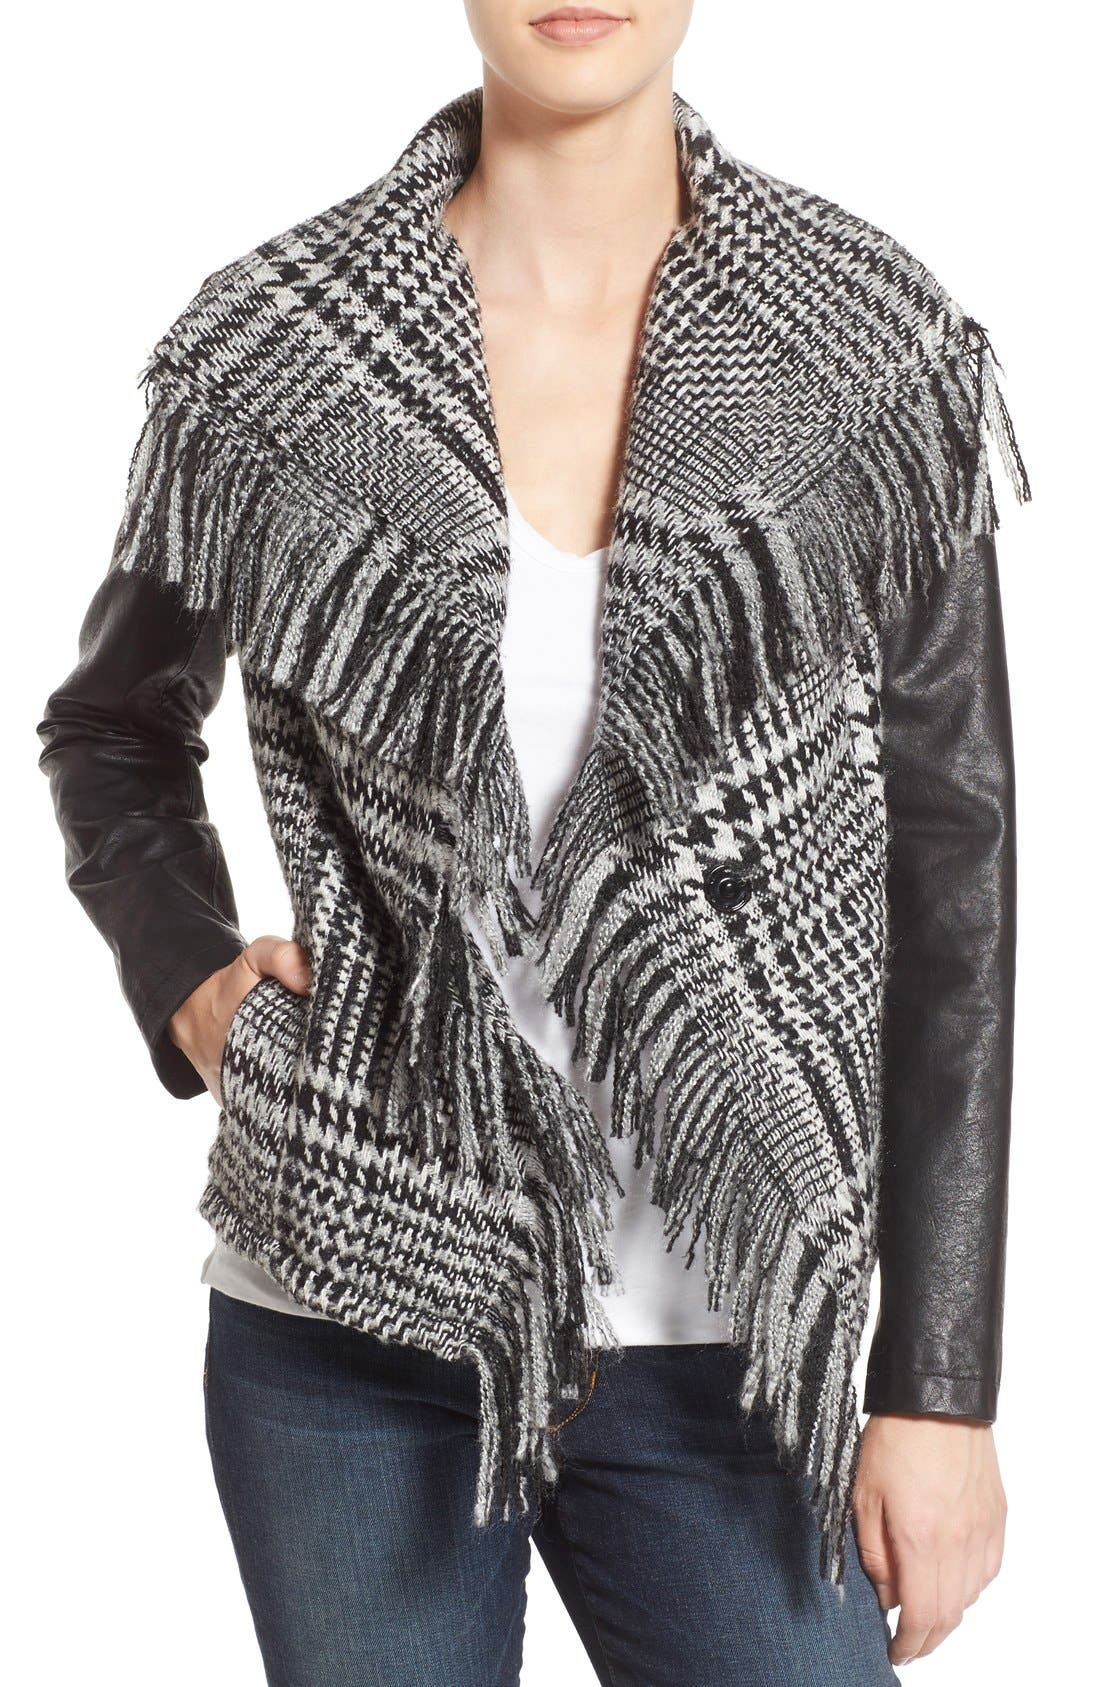 Main Image - GUESS Fringe Trim Glen Plaid Faux Leather Moto Jacket